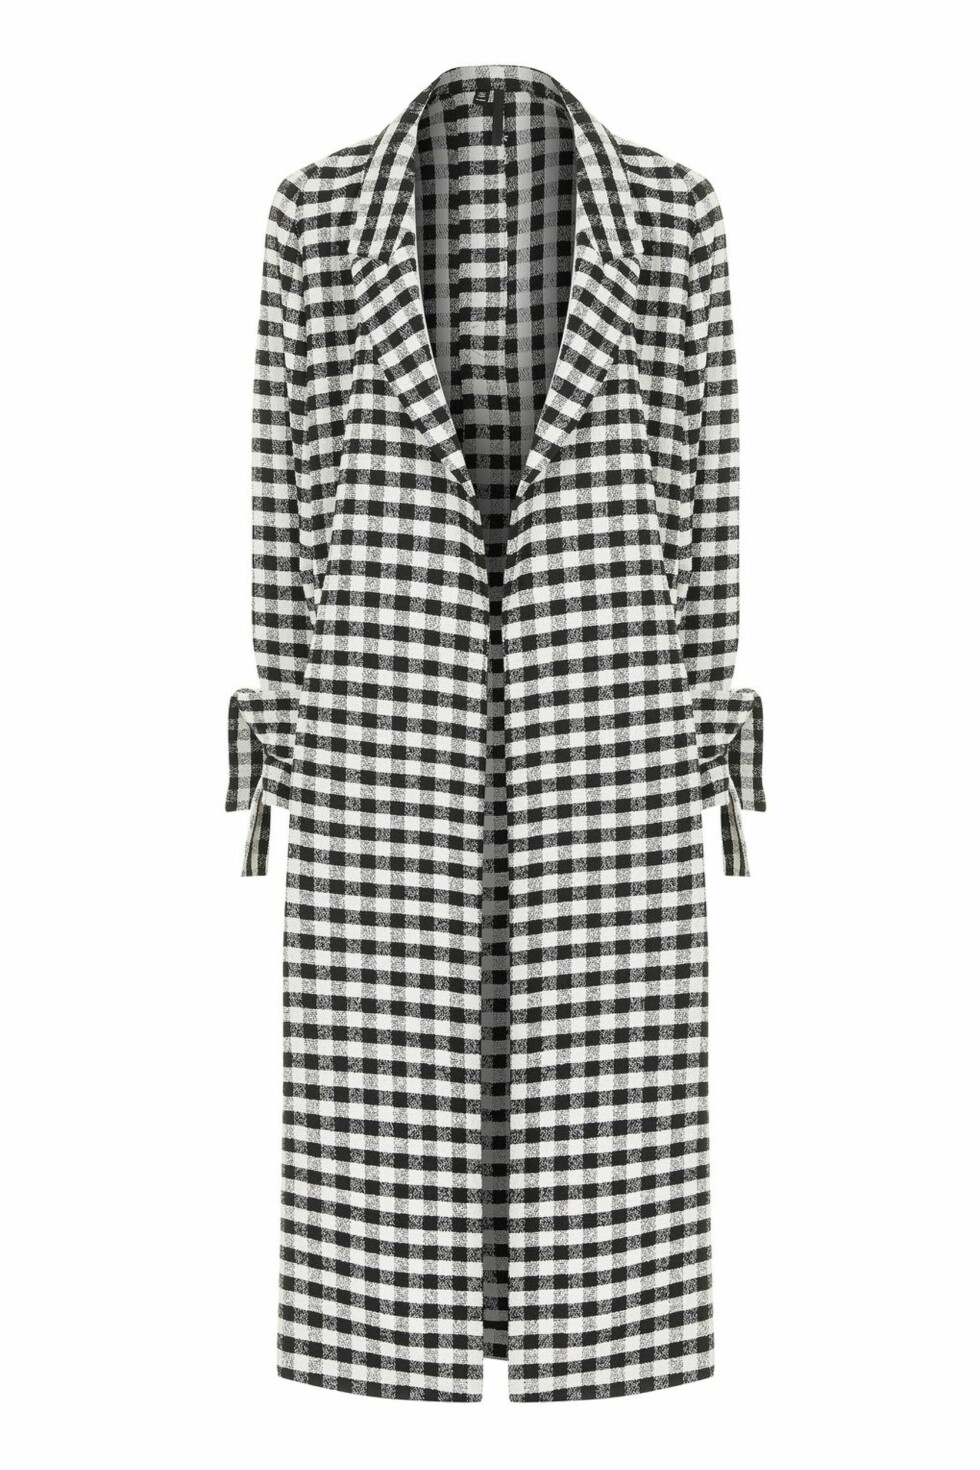 Kåpe fra Topshop   kr 1800   http://www.topshop.com/en/tsuk/product/clothing-427/jackets-coats-2390889/gingham-duster-coat-by-boutique-6218643?bi=0&ps=20